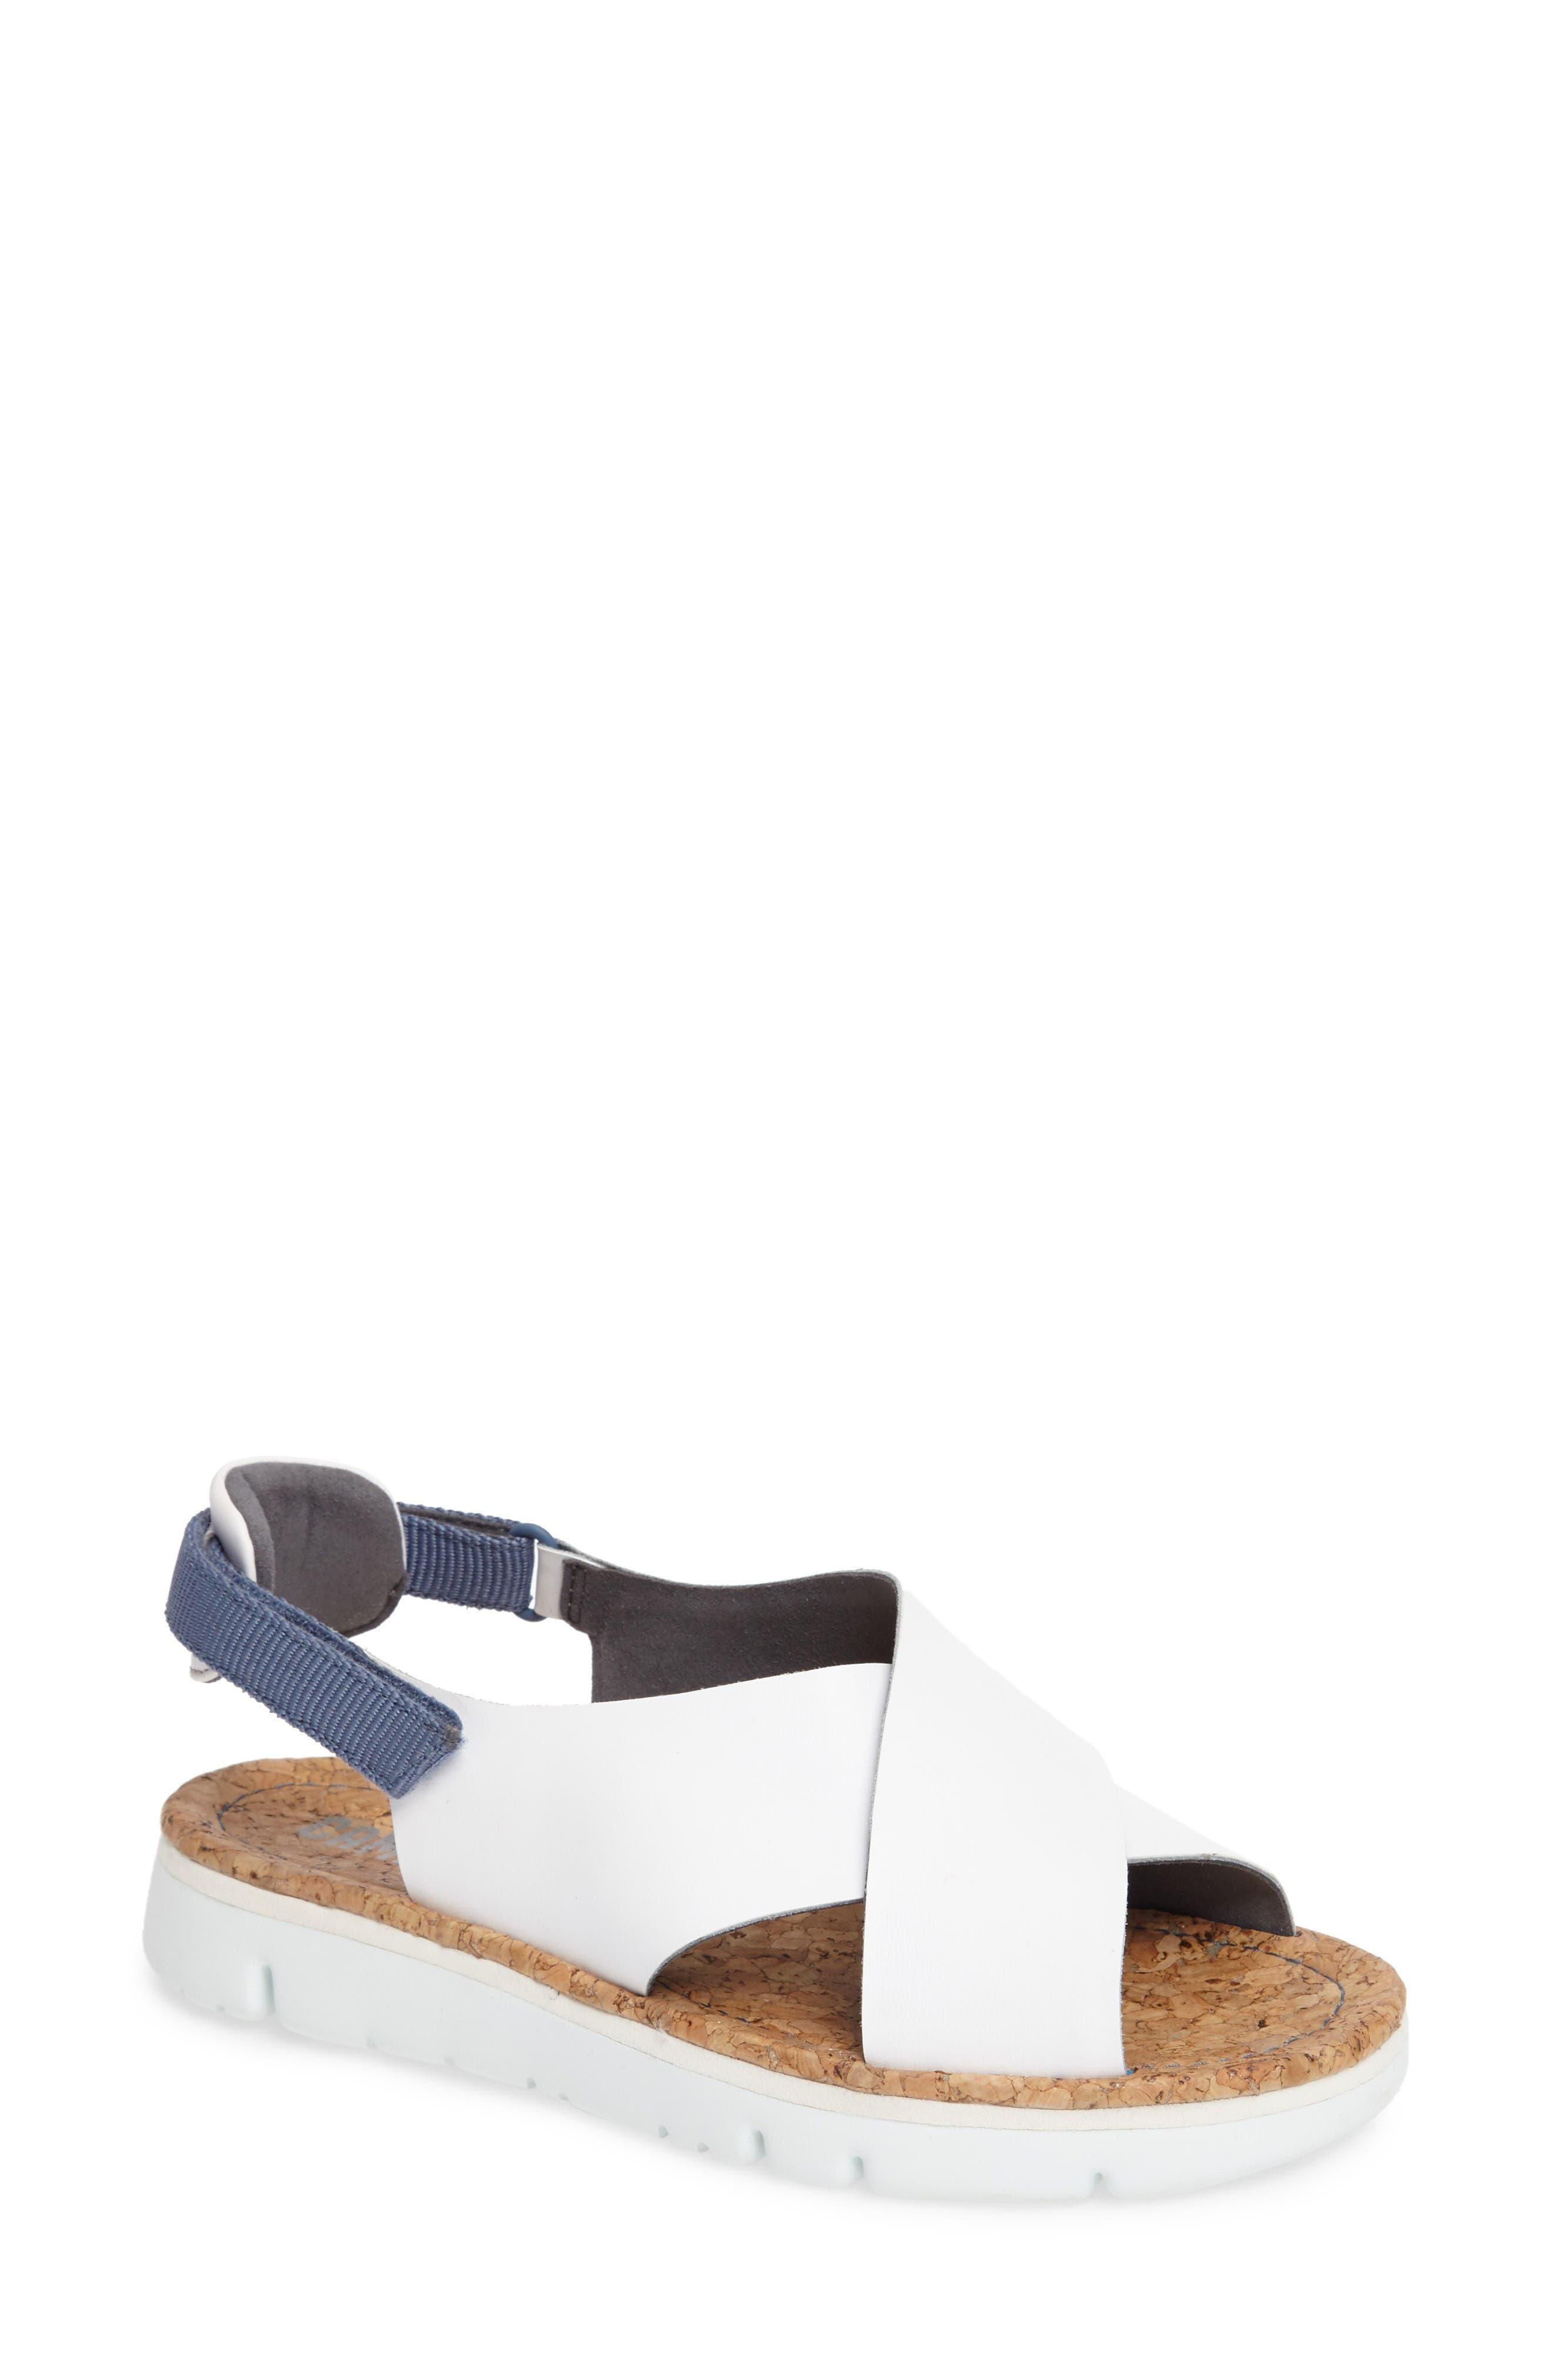 Main Image - Camper 'Oruga' Crisscross Sandal (Women)